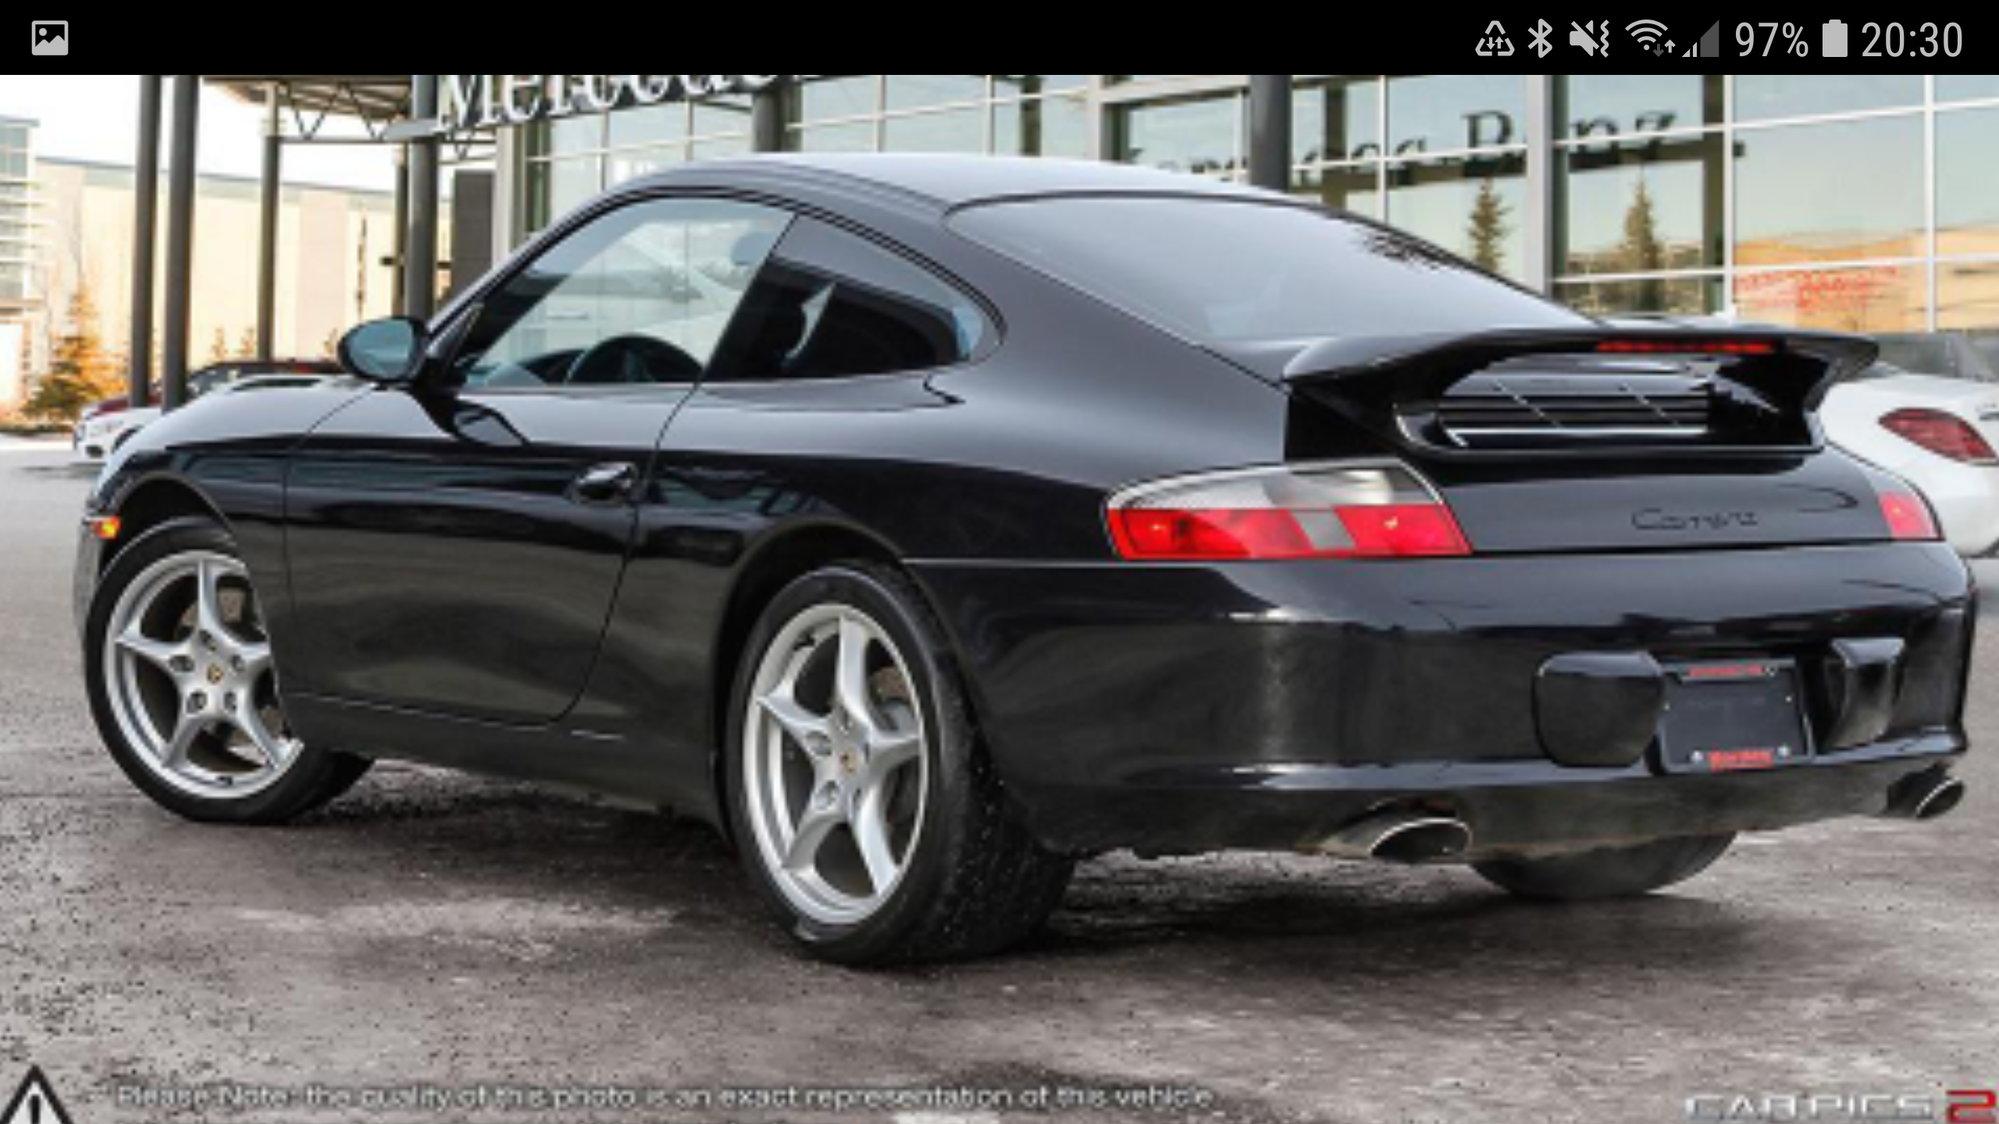 996 Headlight Tint Modification Rennlist Porsche Discussion Forums